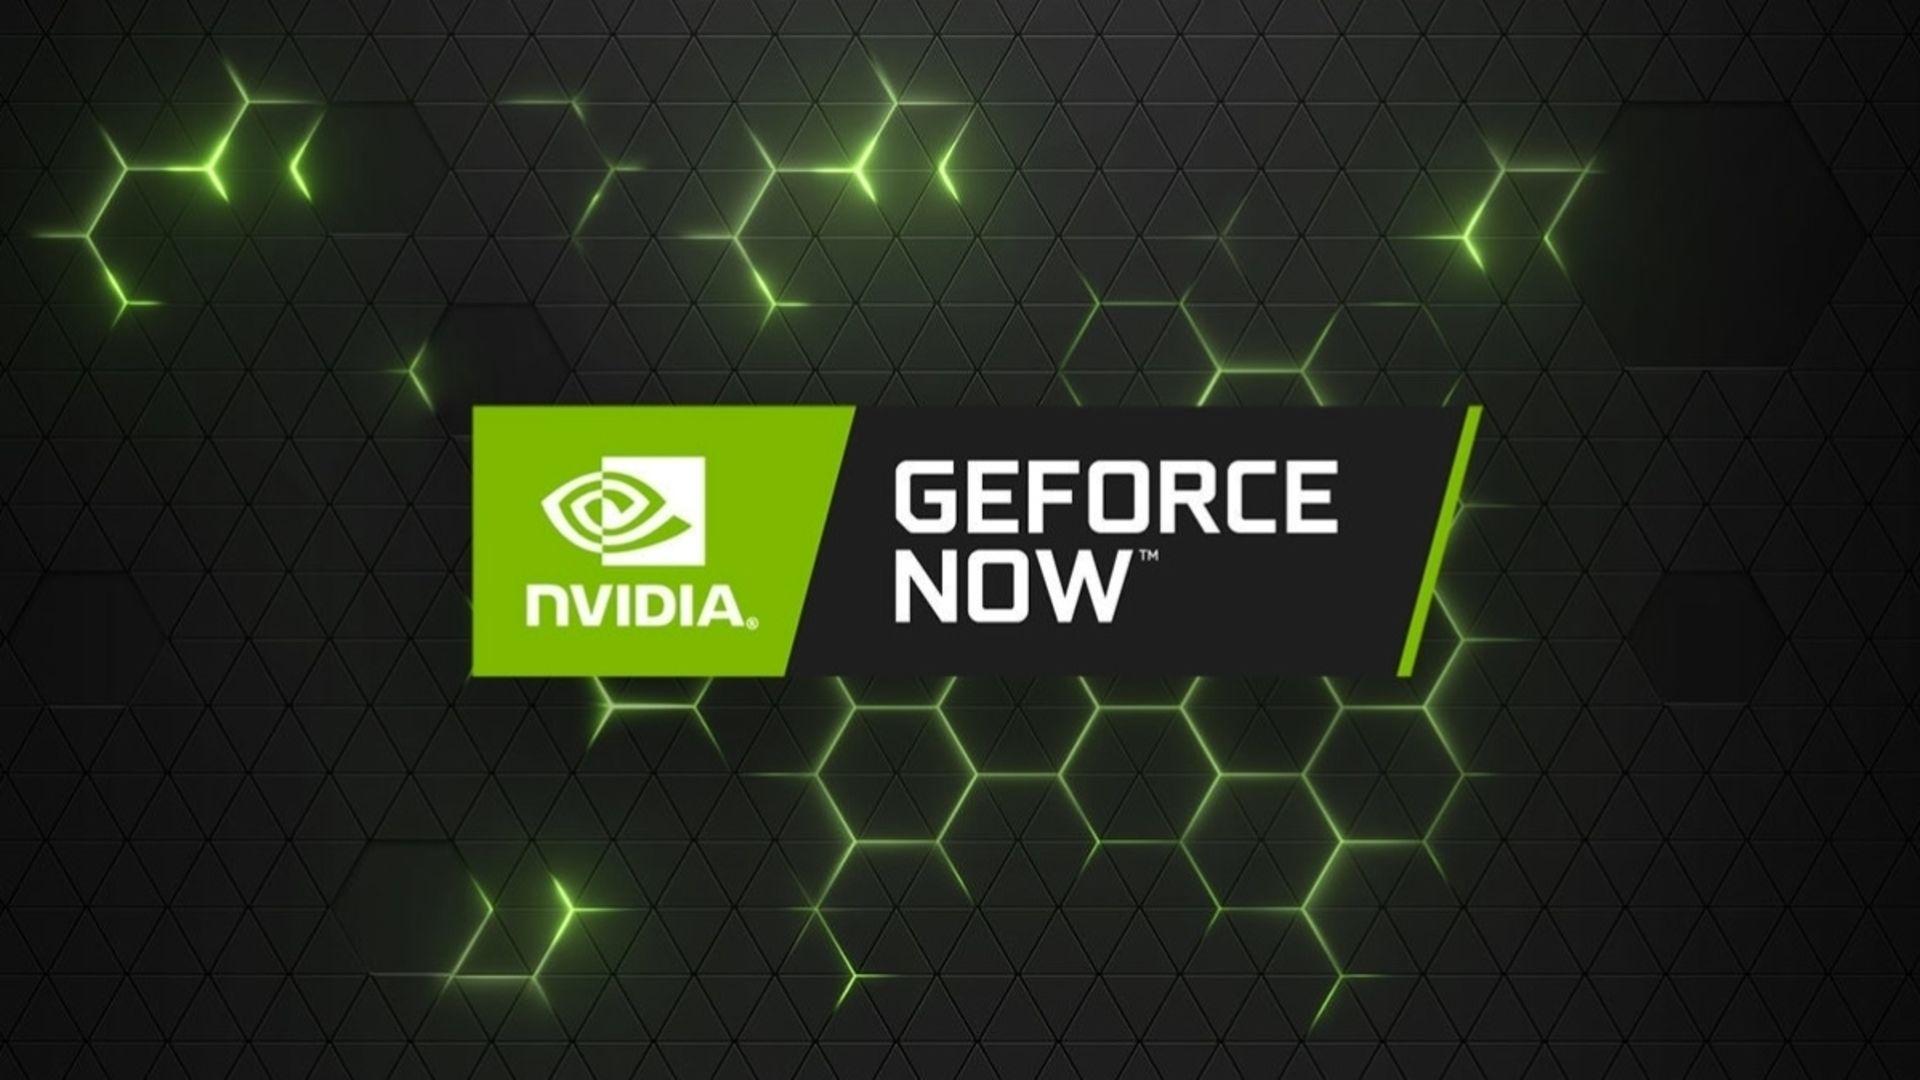 شركة NVIDIA تطلق تحديث GeForce NOW 2.0.27 لدعم متصفح Google Chrome